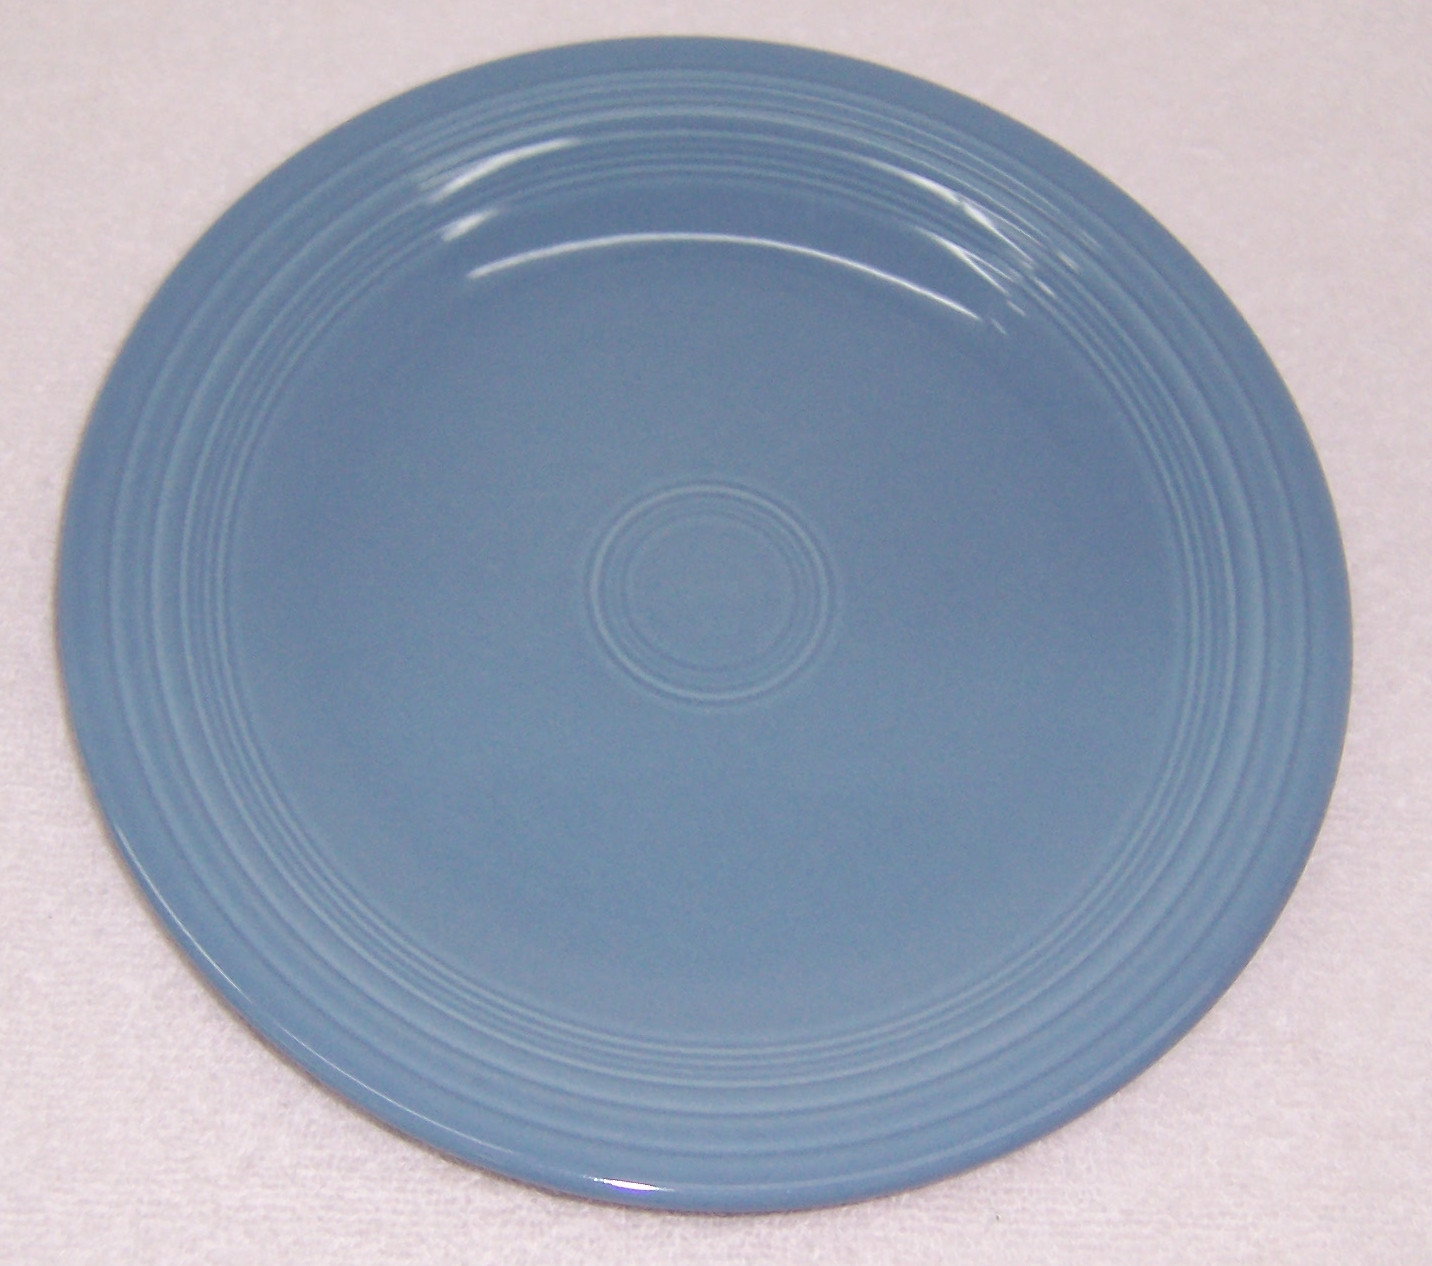 Blue Dinner Plates  Triple A Resale Fiesta Periwinkle Blue Dinner Plate